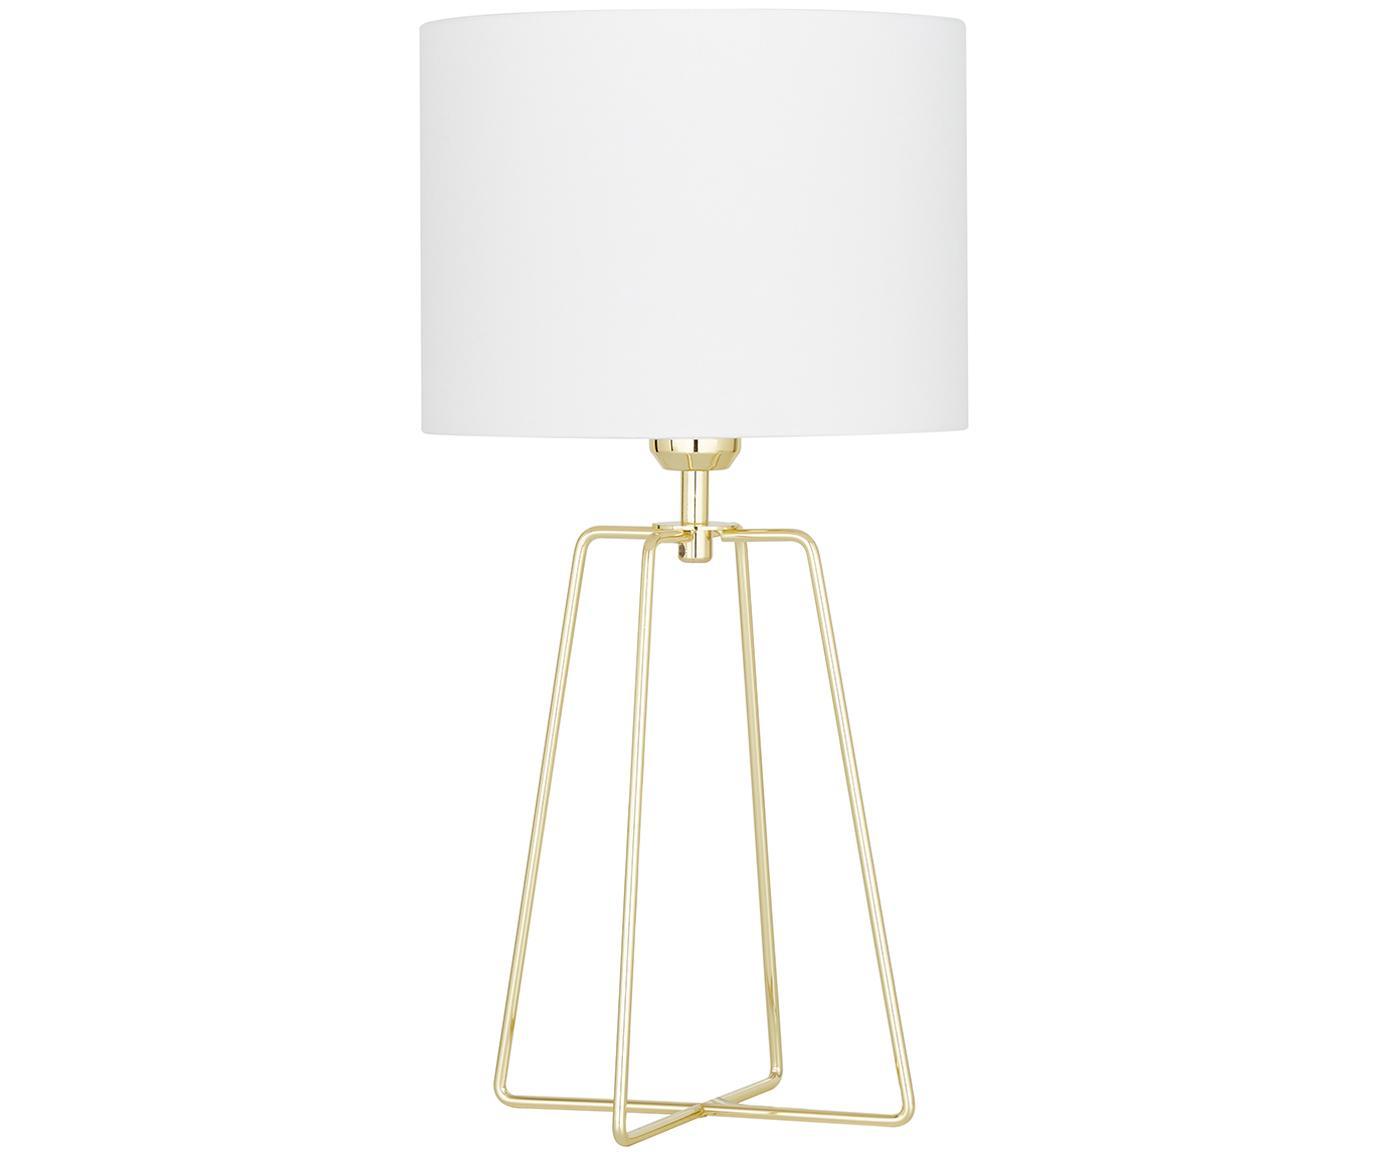 Tafellamp Miranda, Lampenkap: fluweel, Lampvoet: vermessingd metaal, Lampenkap: wit. Lampvoet: glanzend messingkleurig. Snoer: transparant, Ø 25 x H 49 cm